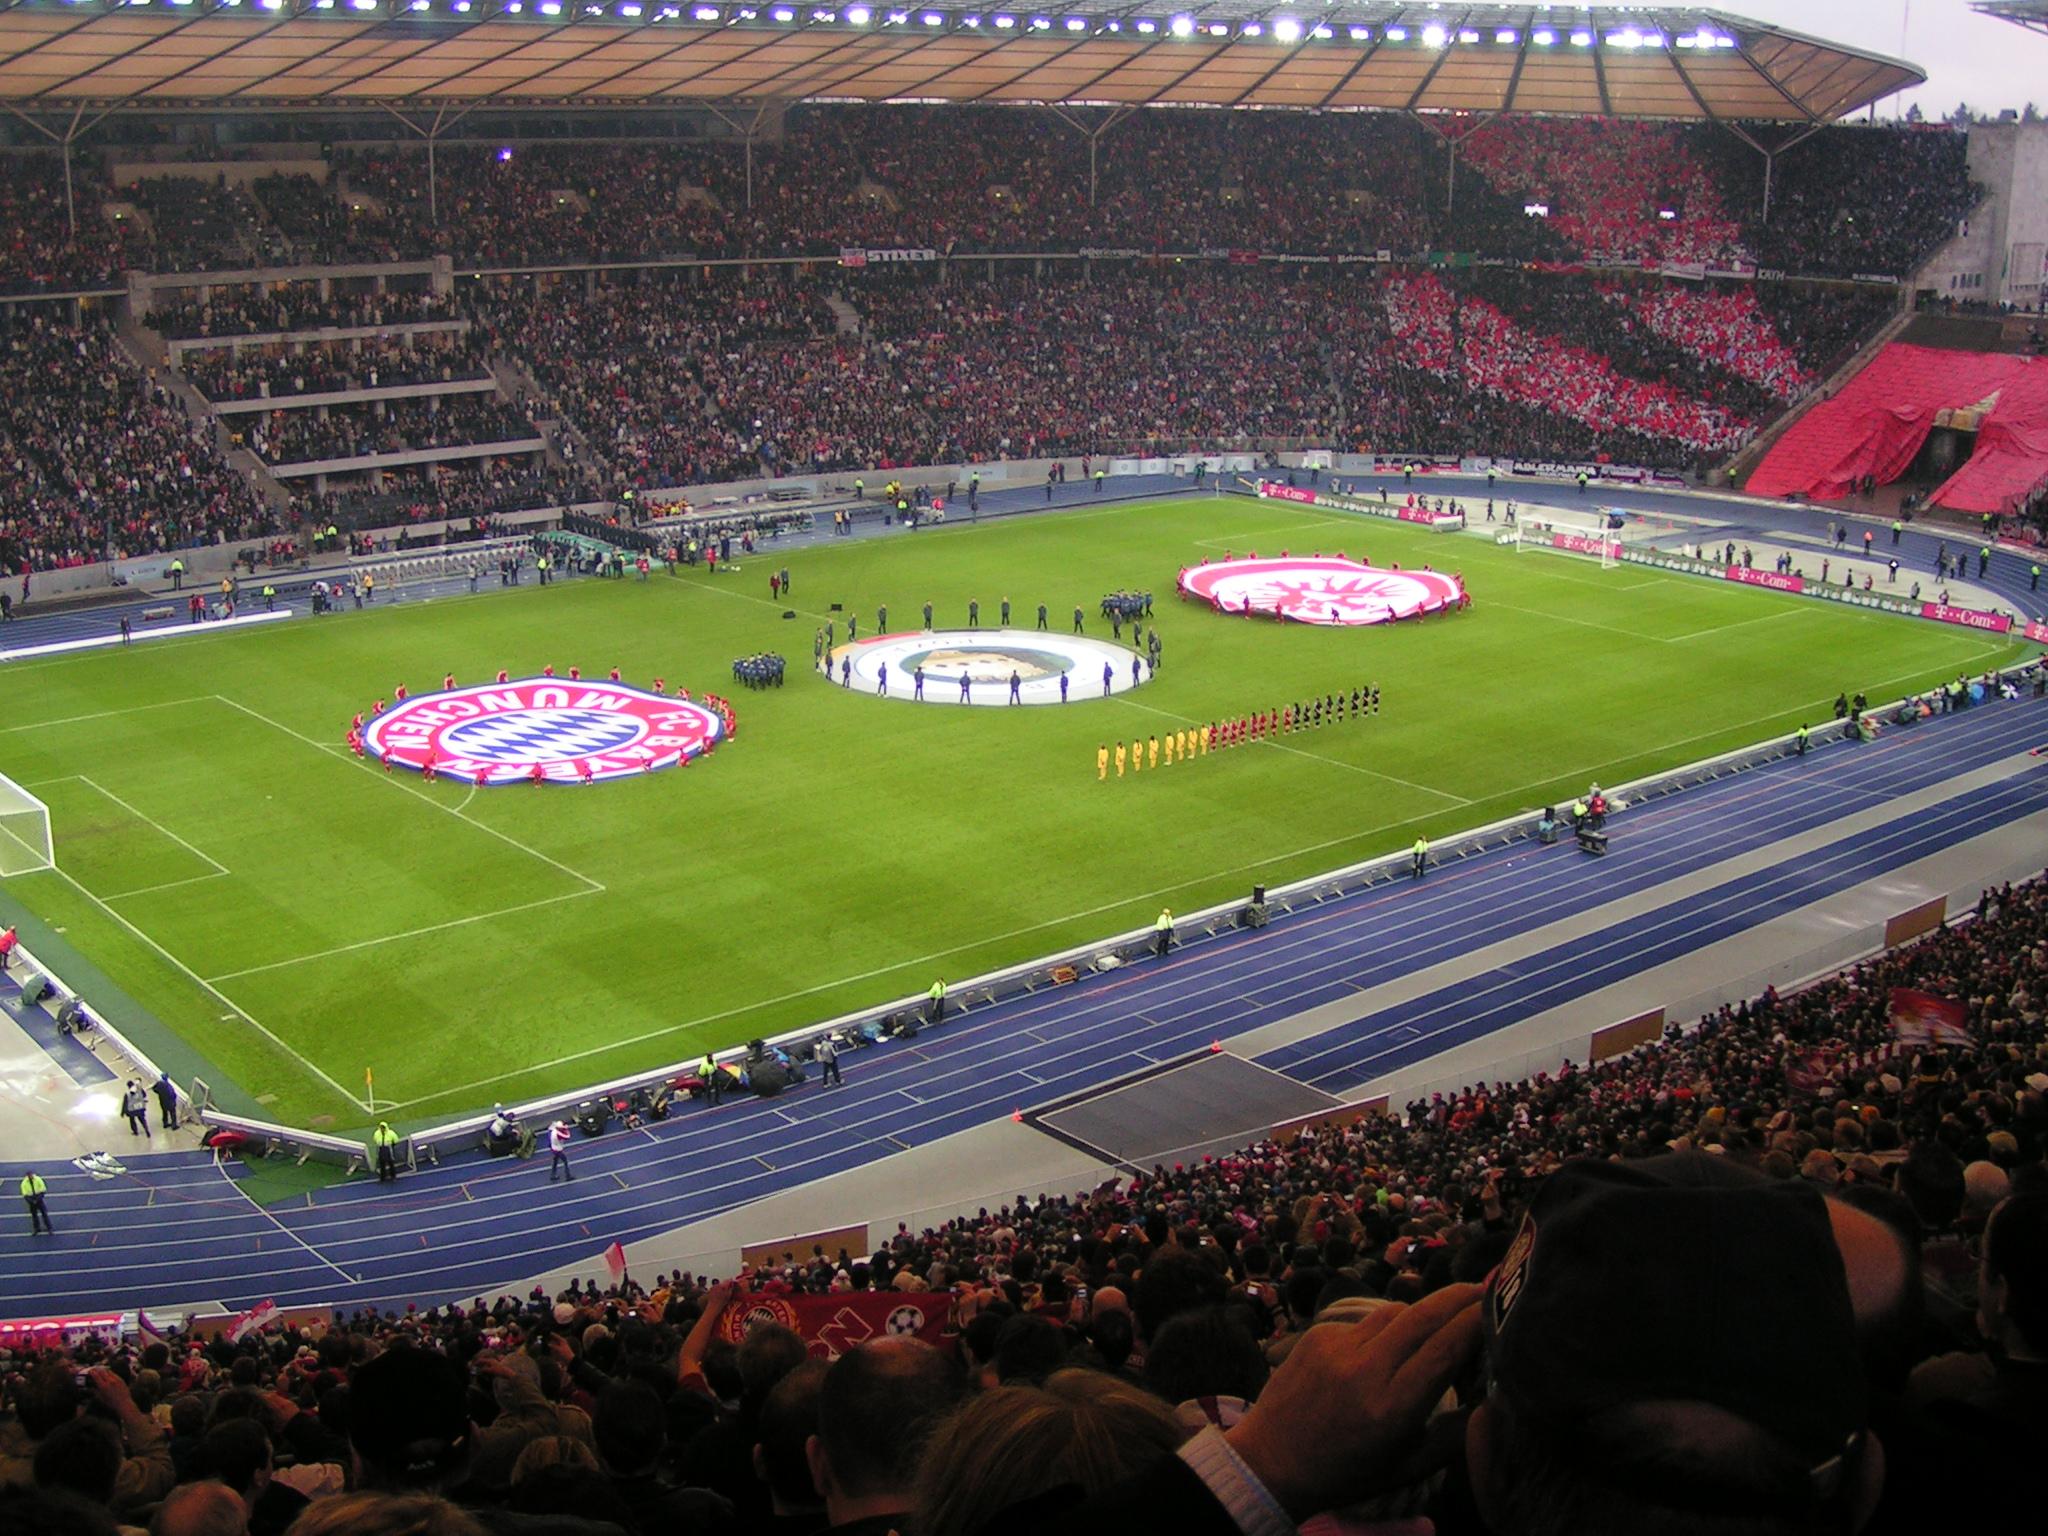 2005 2006 7 Spielertrikot Dfb Pokal Benny K Hler